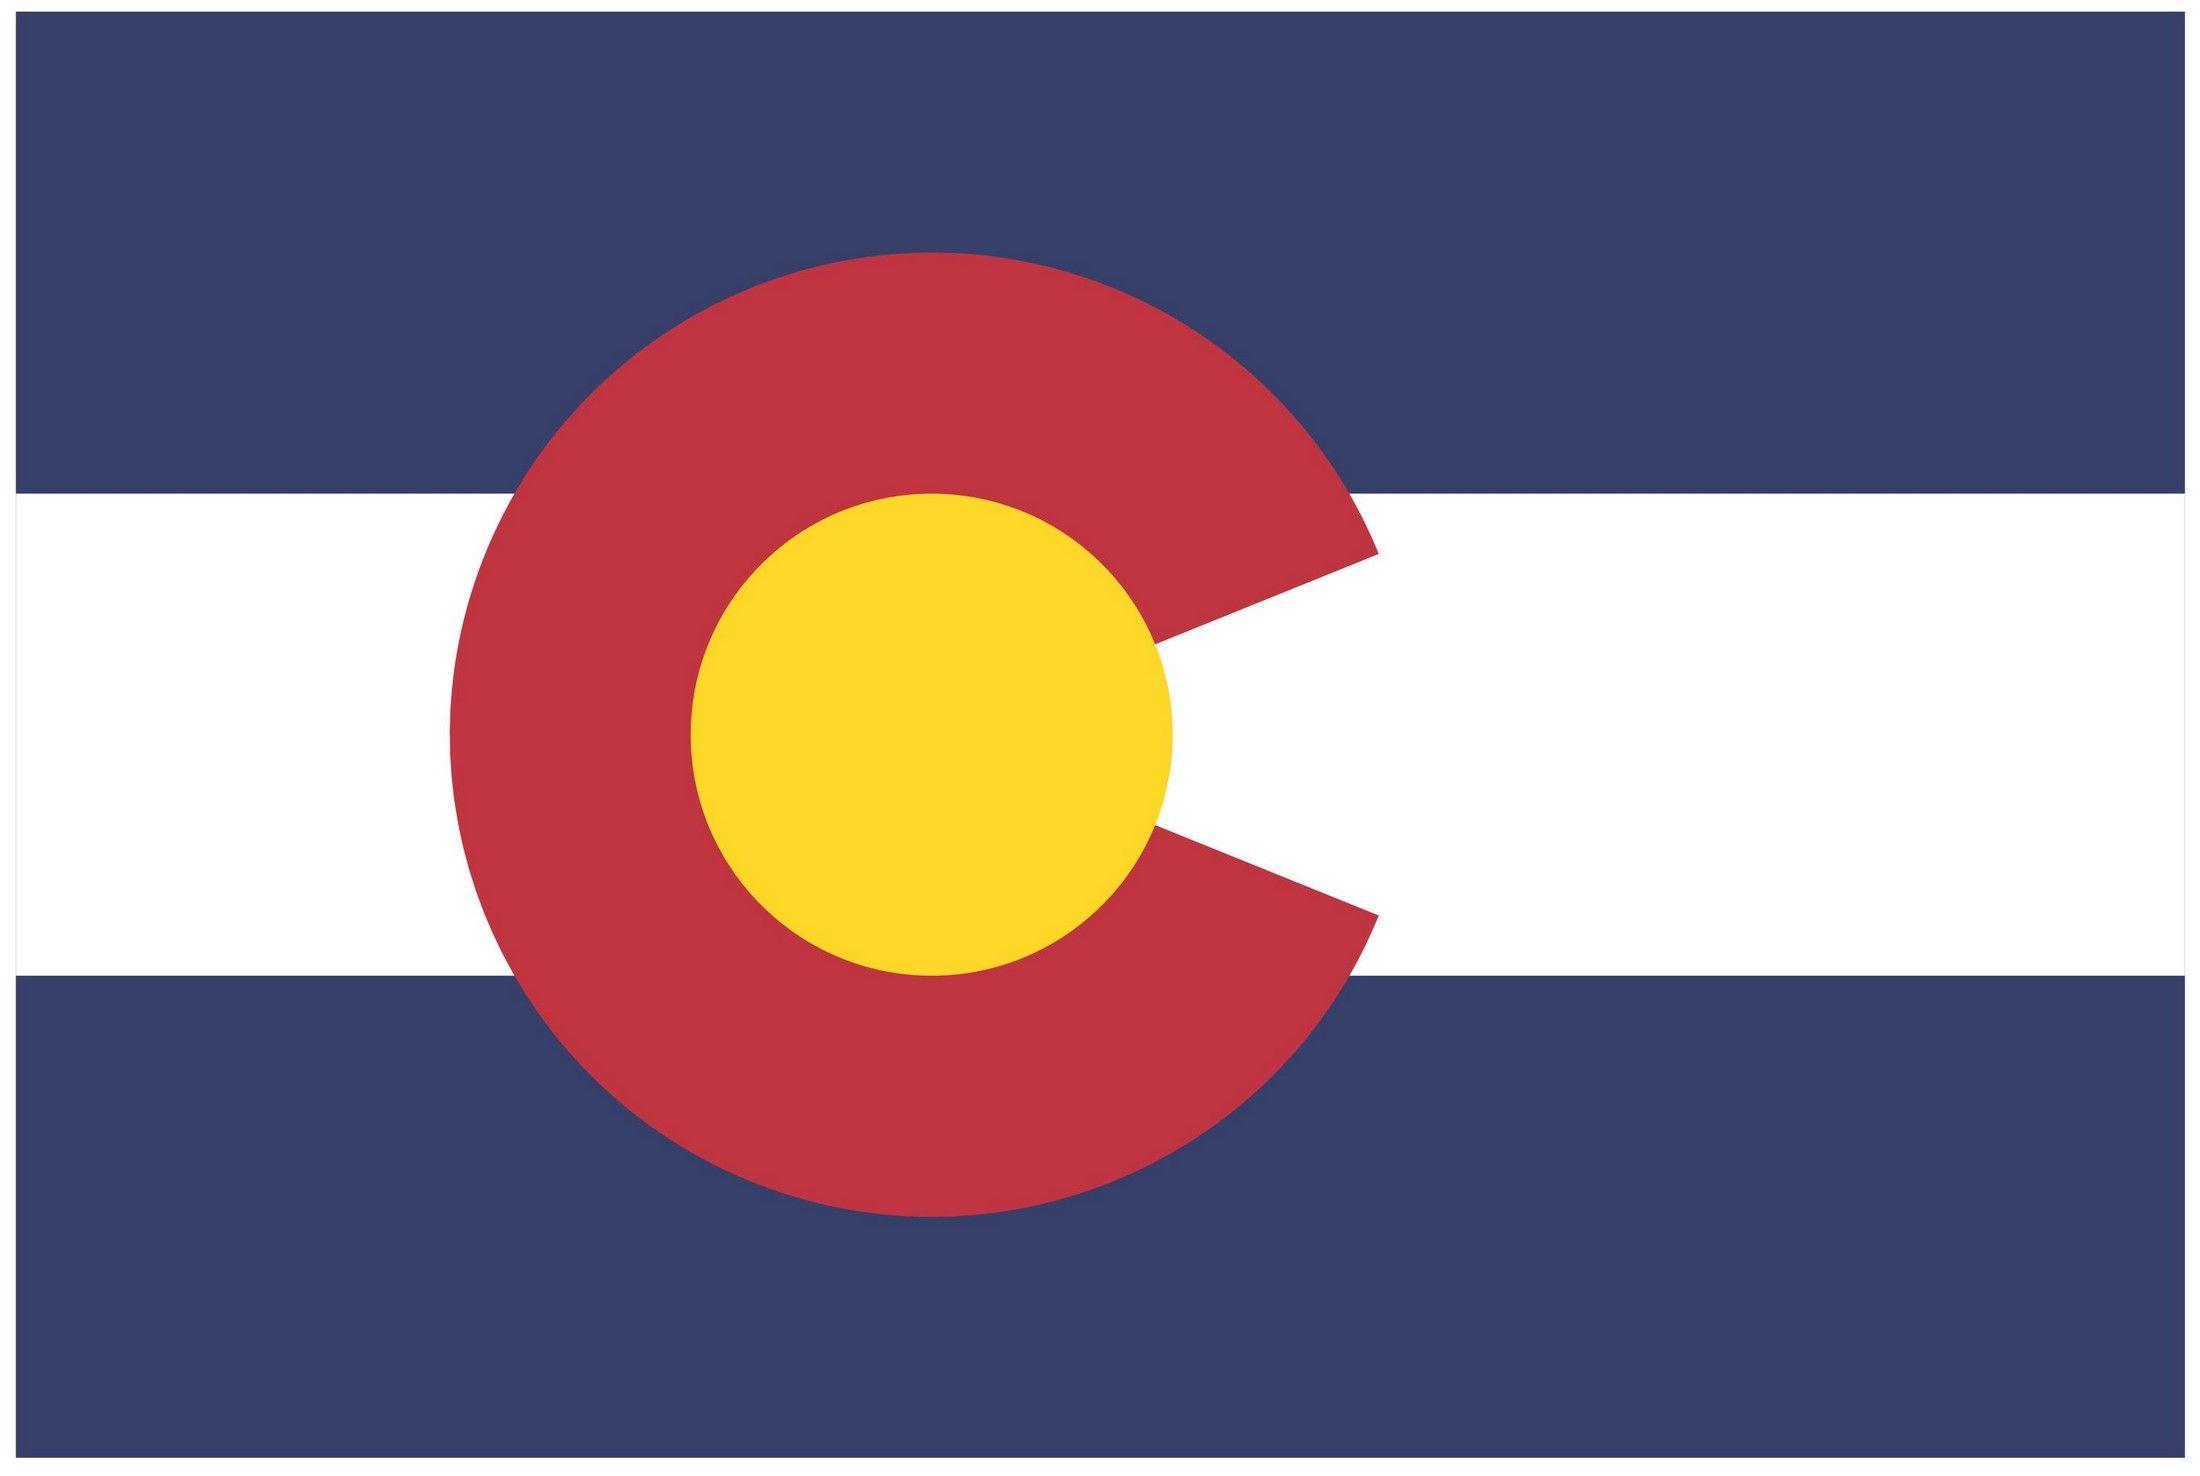 Colorado State Flag Seal Eps Files Colorado State Flag State Flags Flag